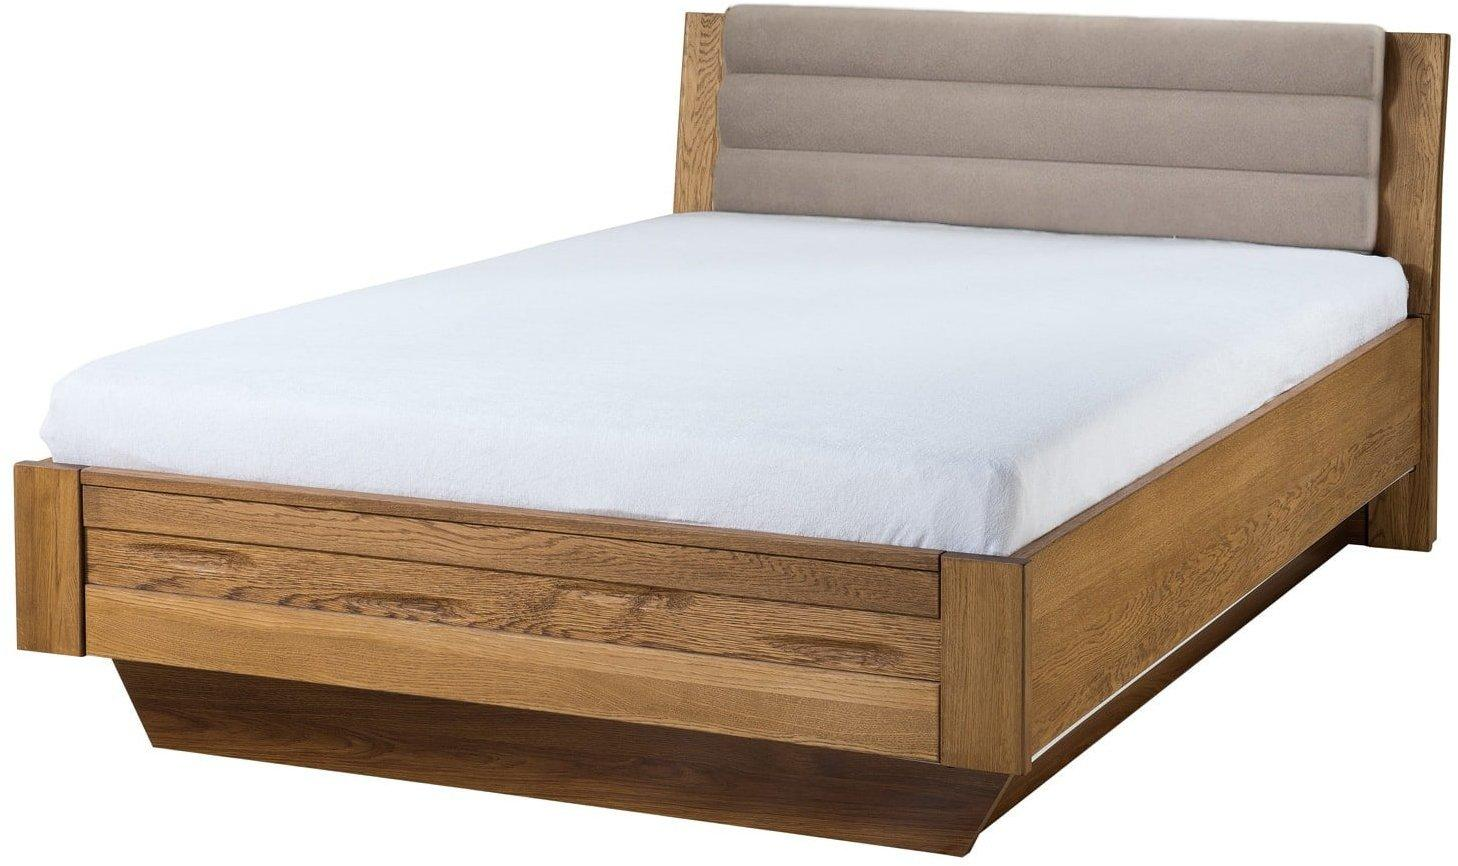 Szynaka Manželská posteľ Velvet 74 Farba: Latte